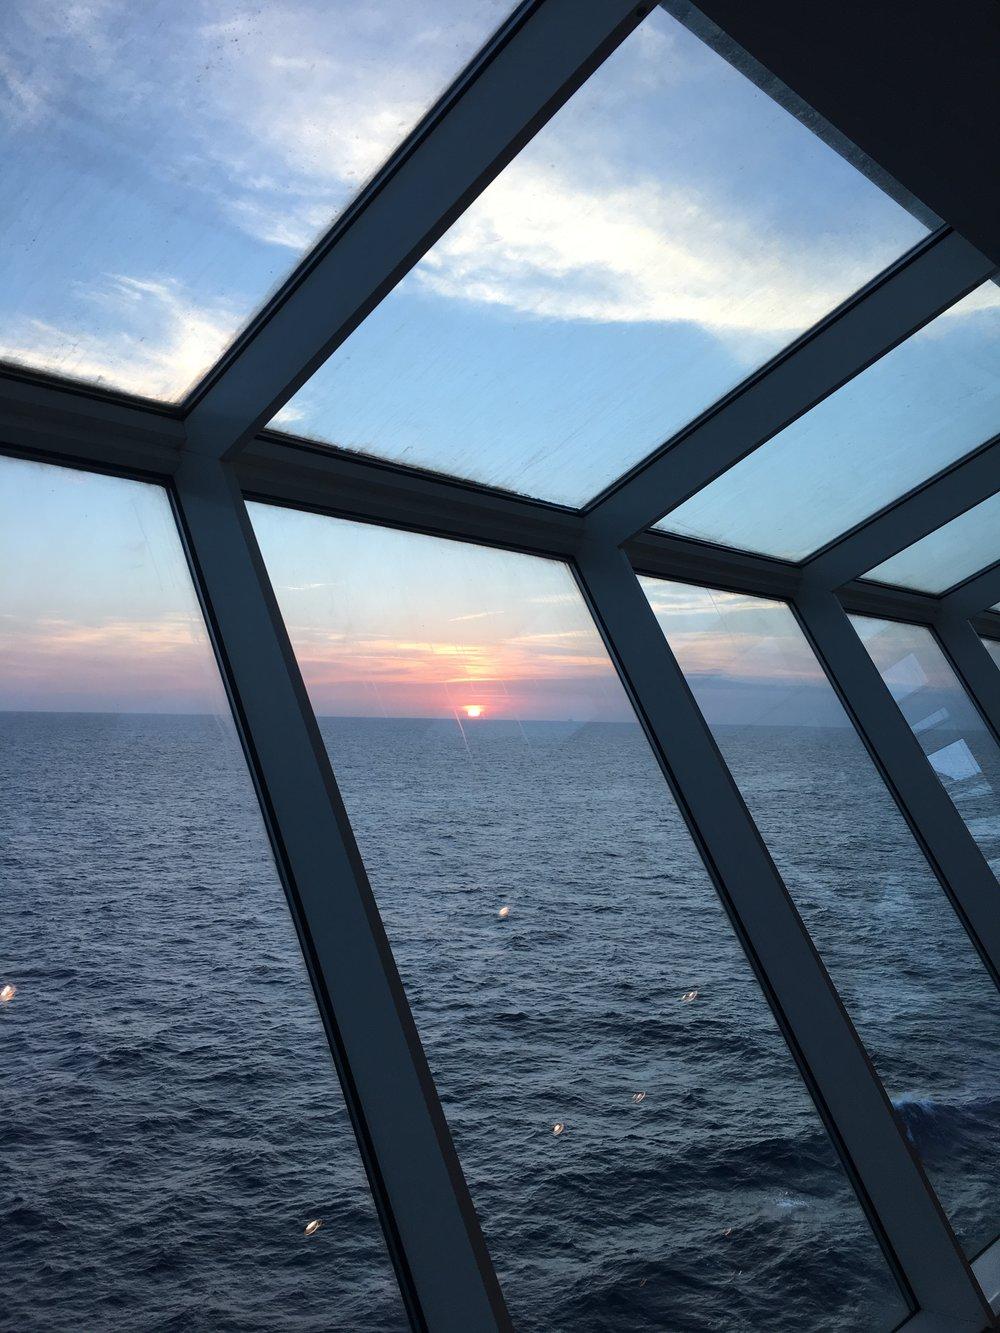 Windjammer, sunset view (k klofft)